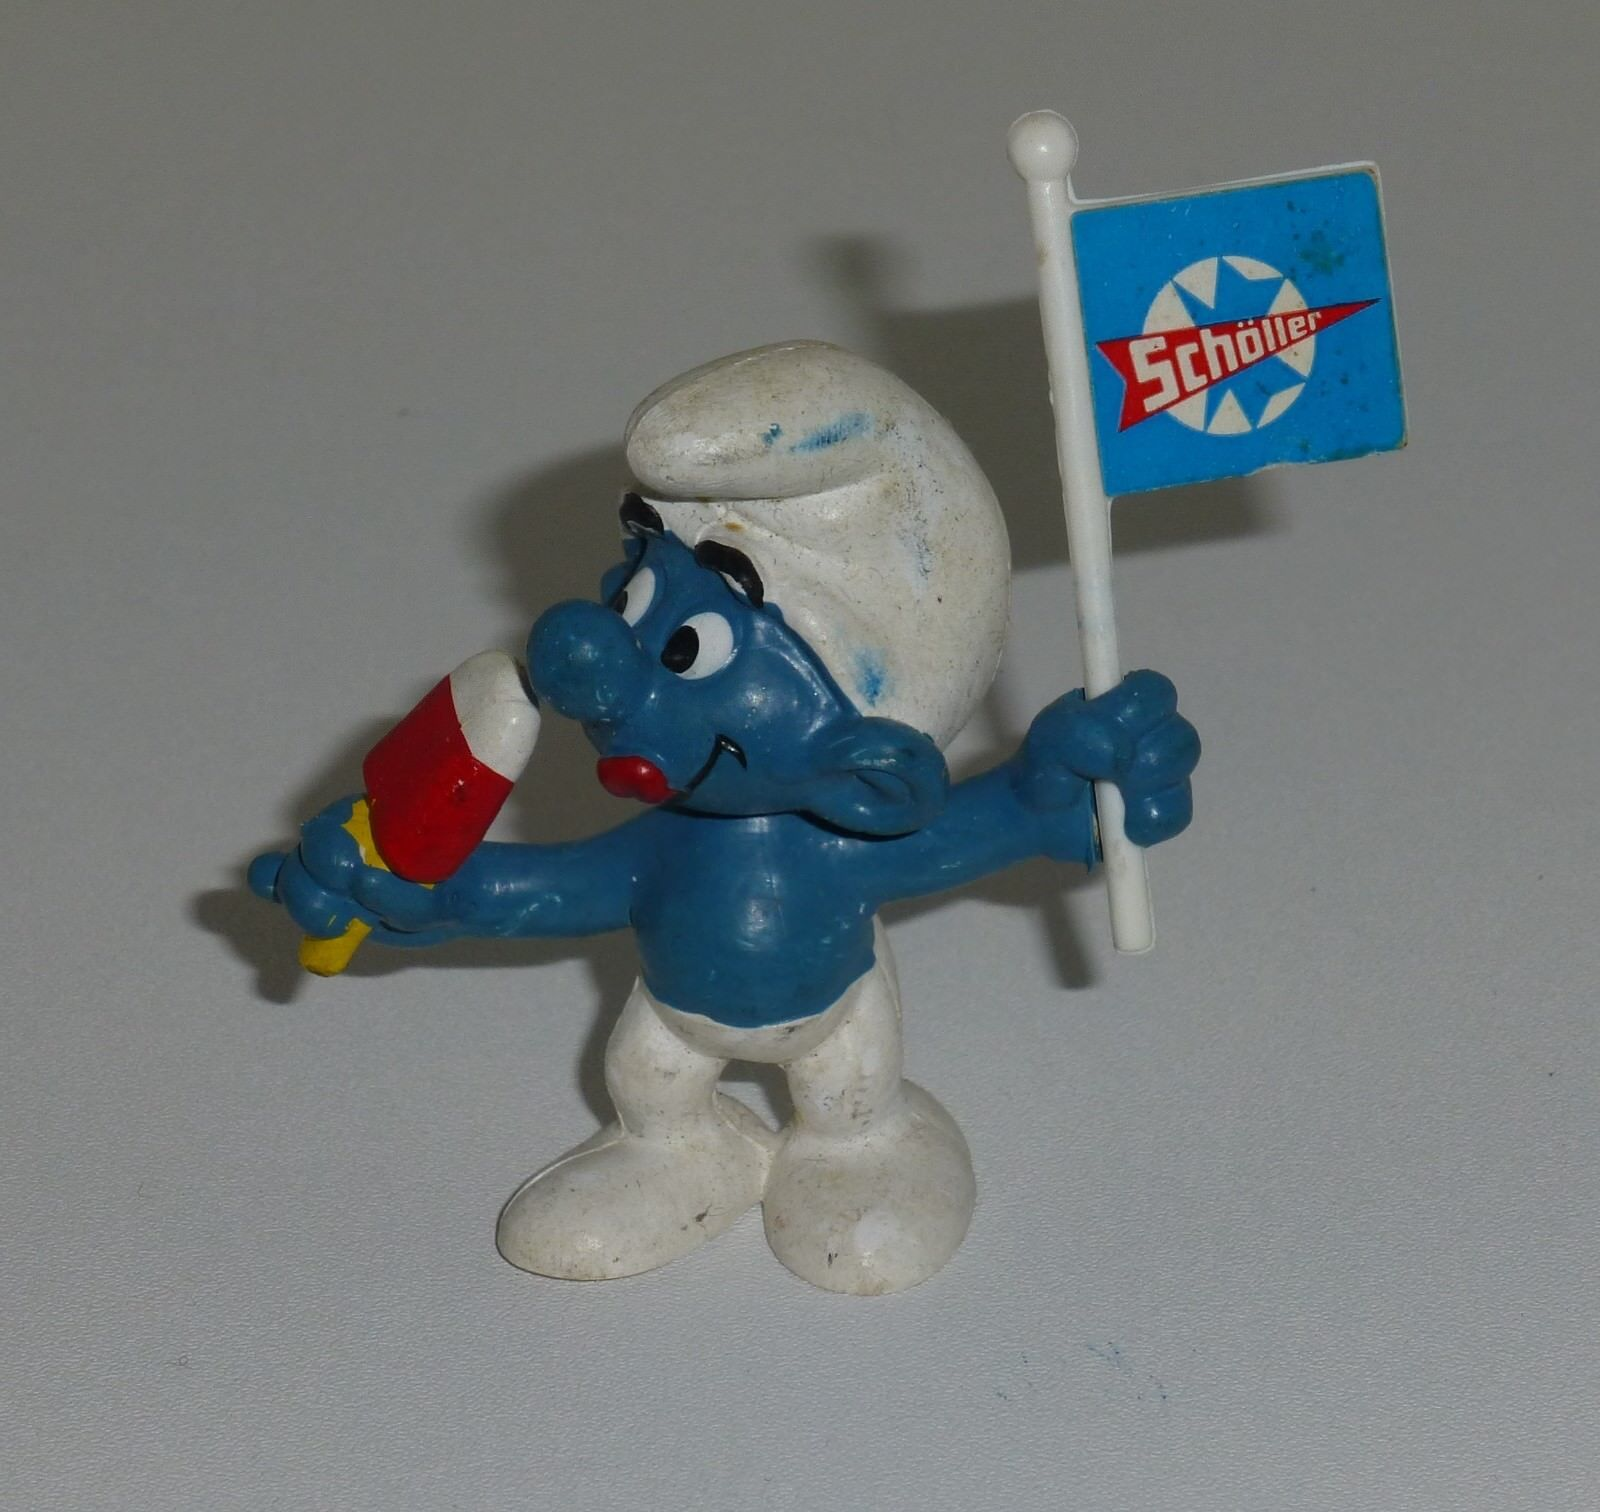 Figurine Schtroumpf   20053 - PROMO scholler  - TBE (Smurf Puffi Schlumpfe)